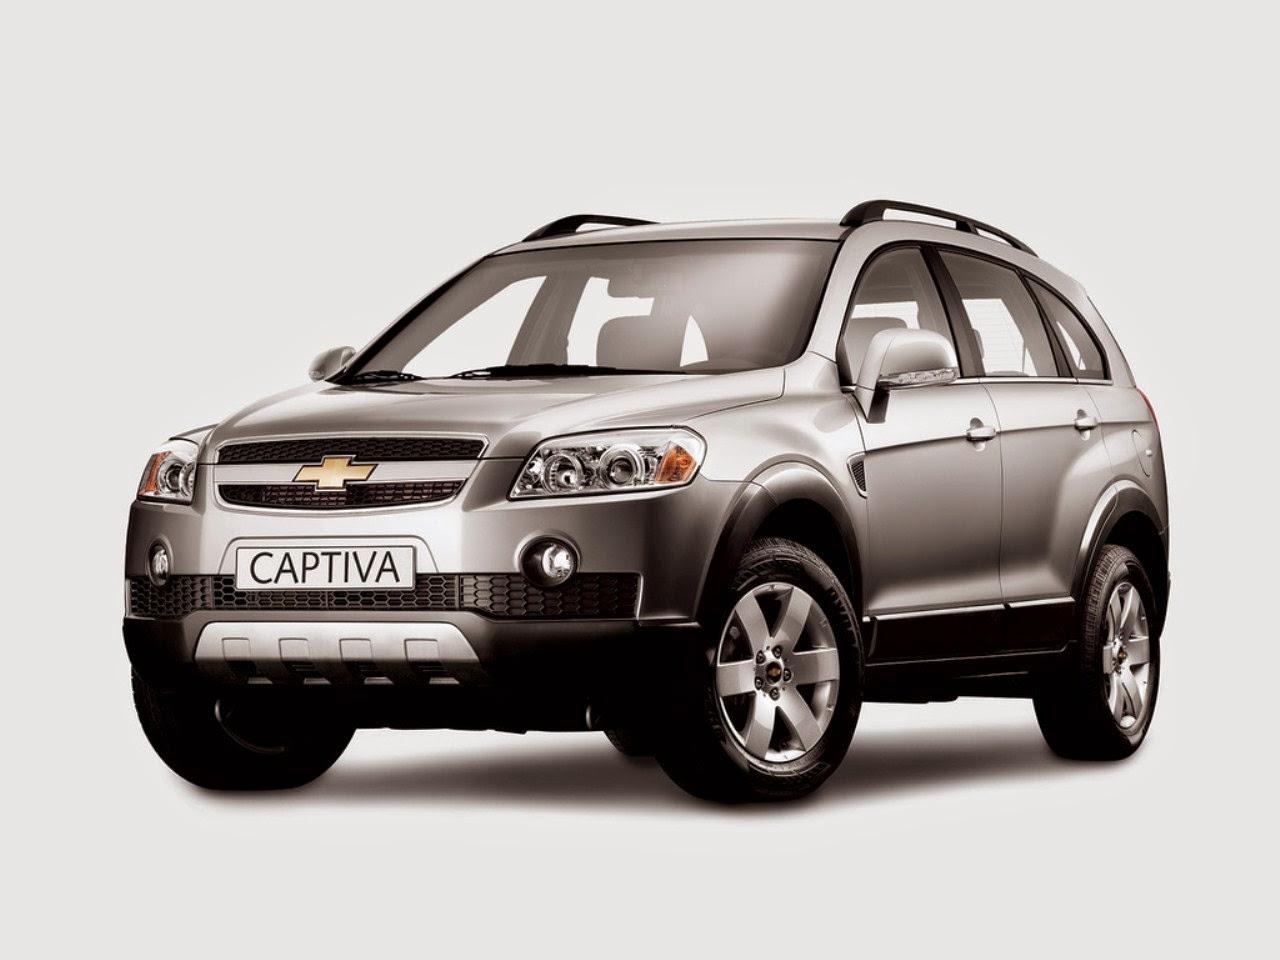 2014 chevrolet captiva car pictures 2017 2018 cars news. Black Bedroom Furniture Sets. Home Design Ideas